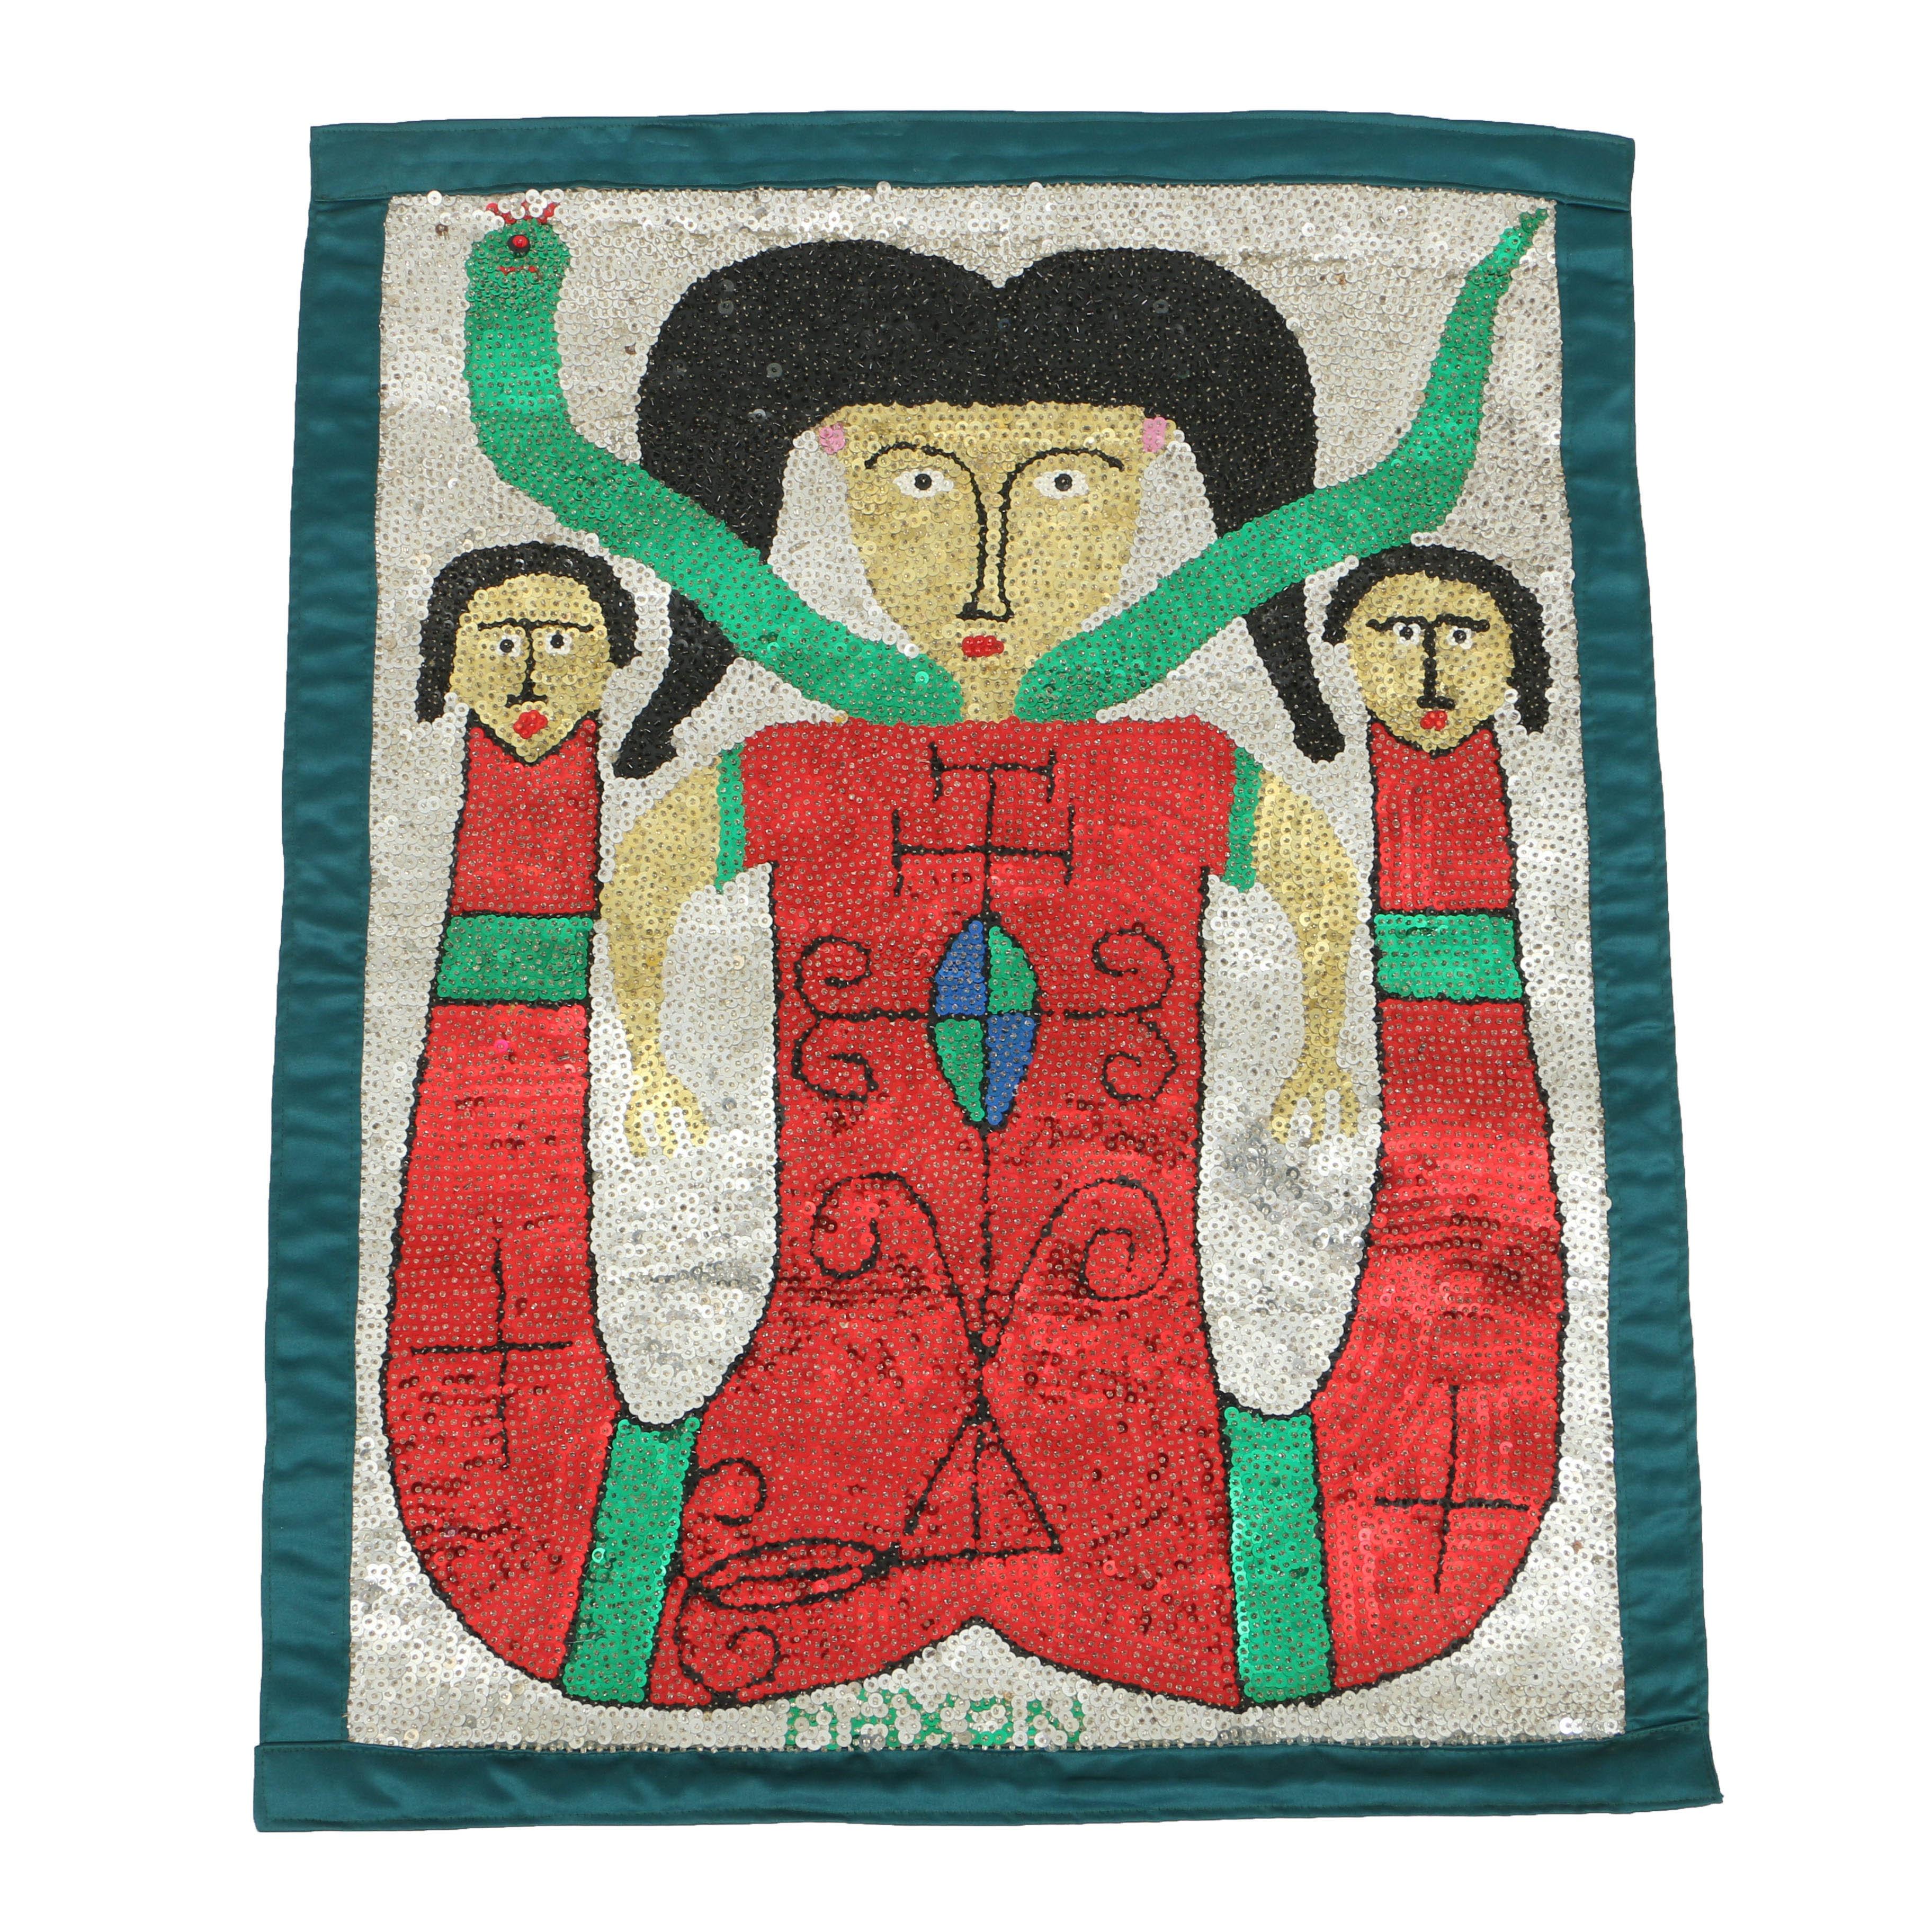 Maxon Sylla Haitian Vodou Folk Art Flag